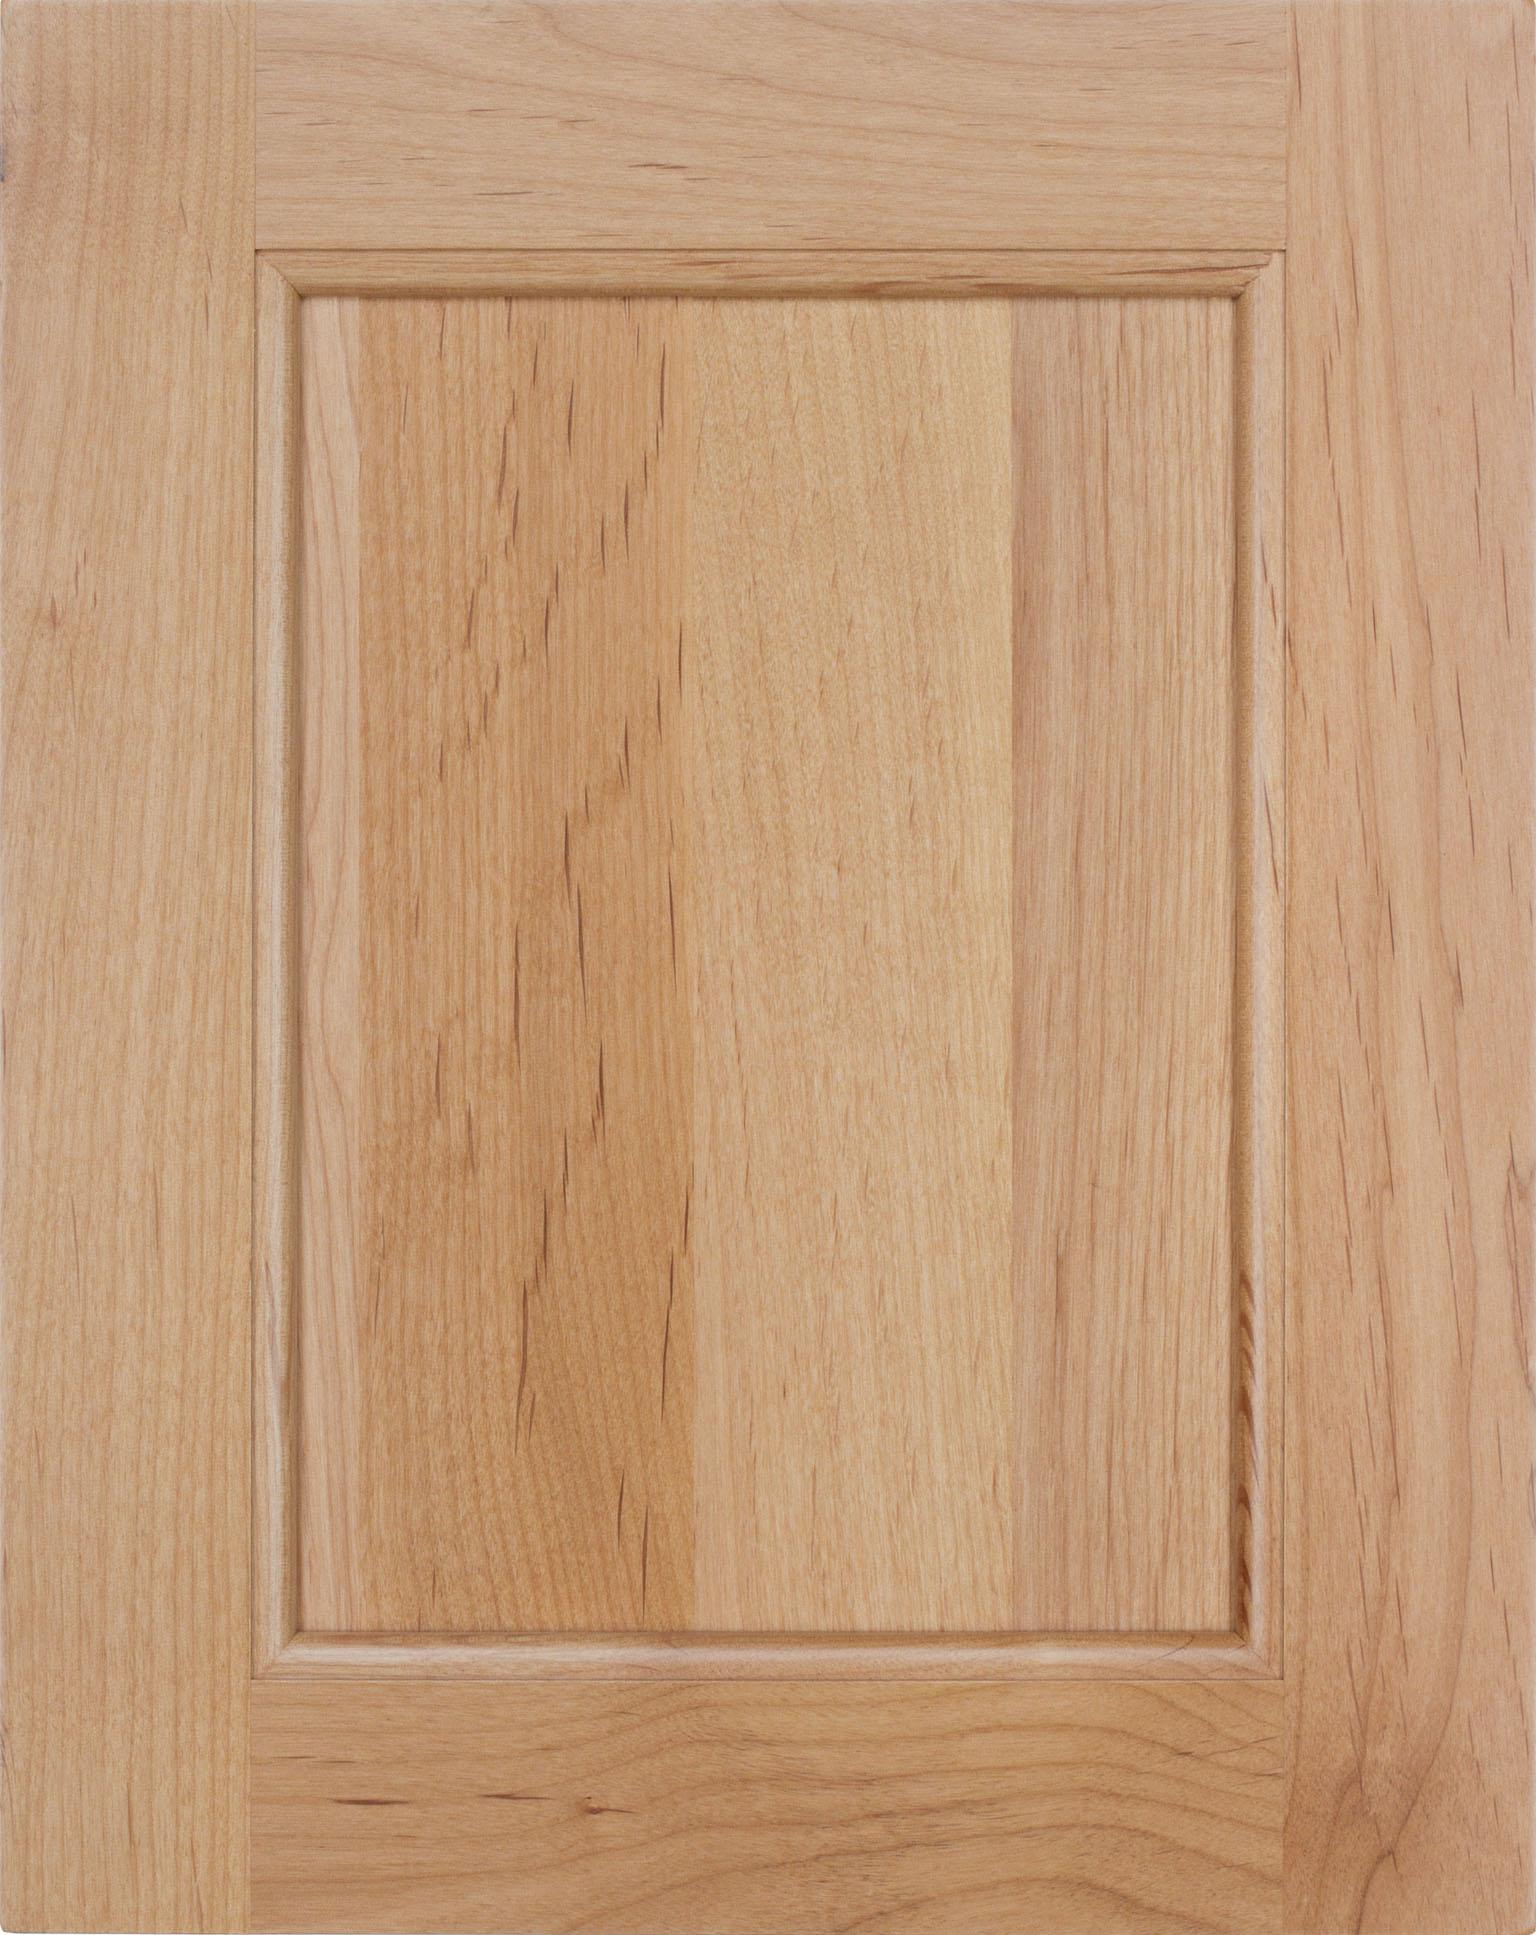 Stafford Flat Panel Cabinet